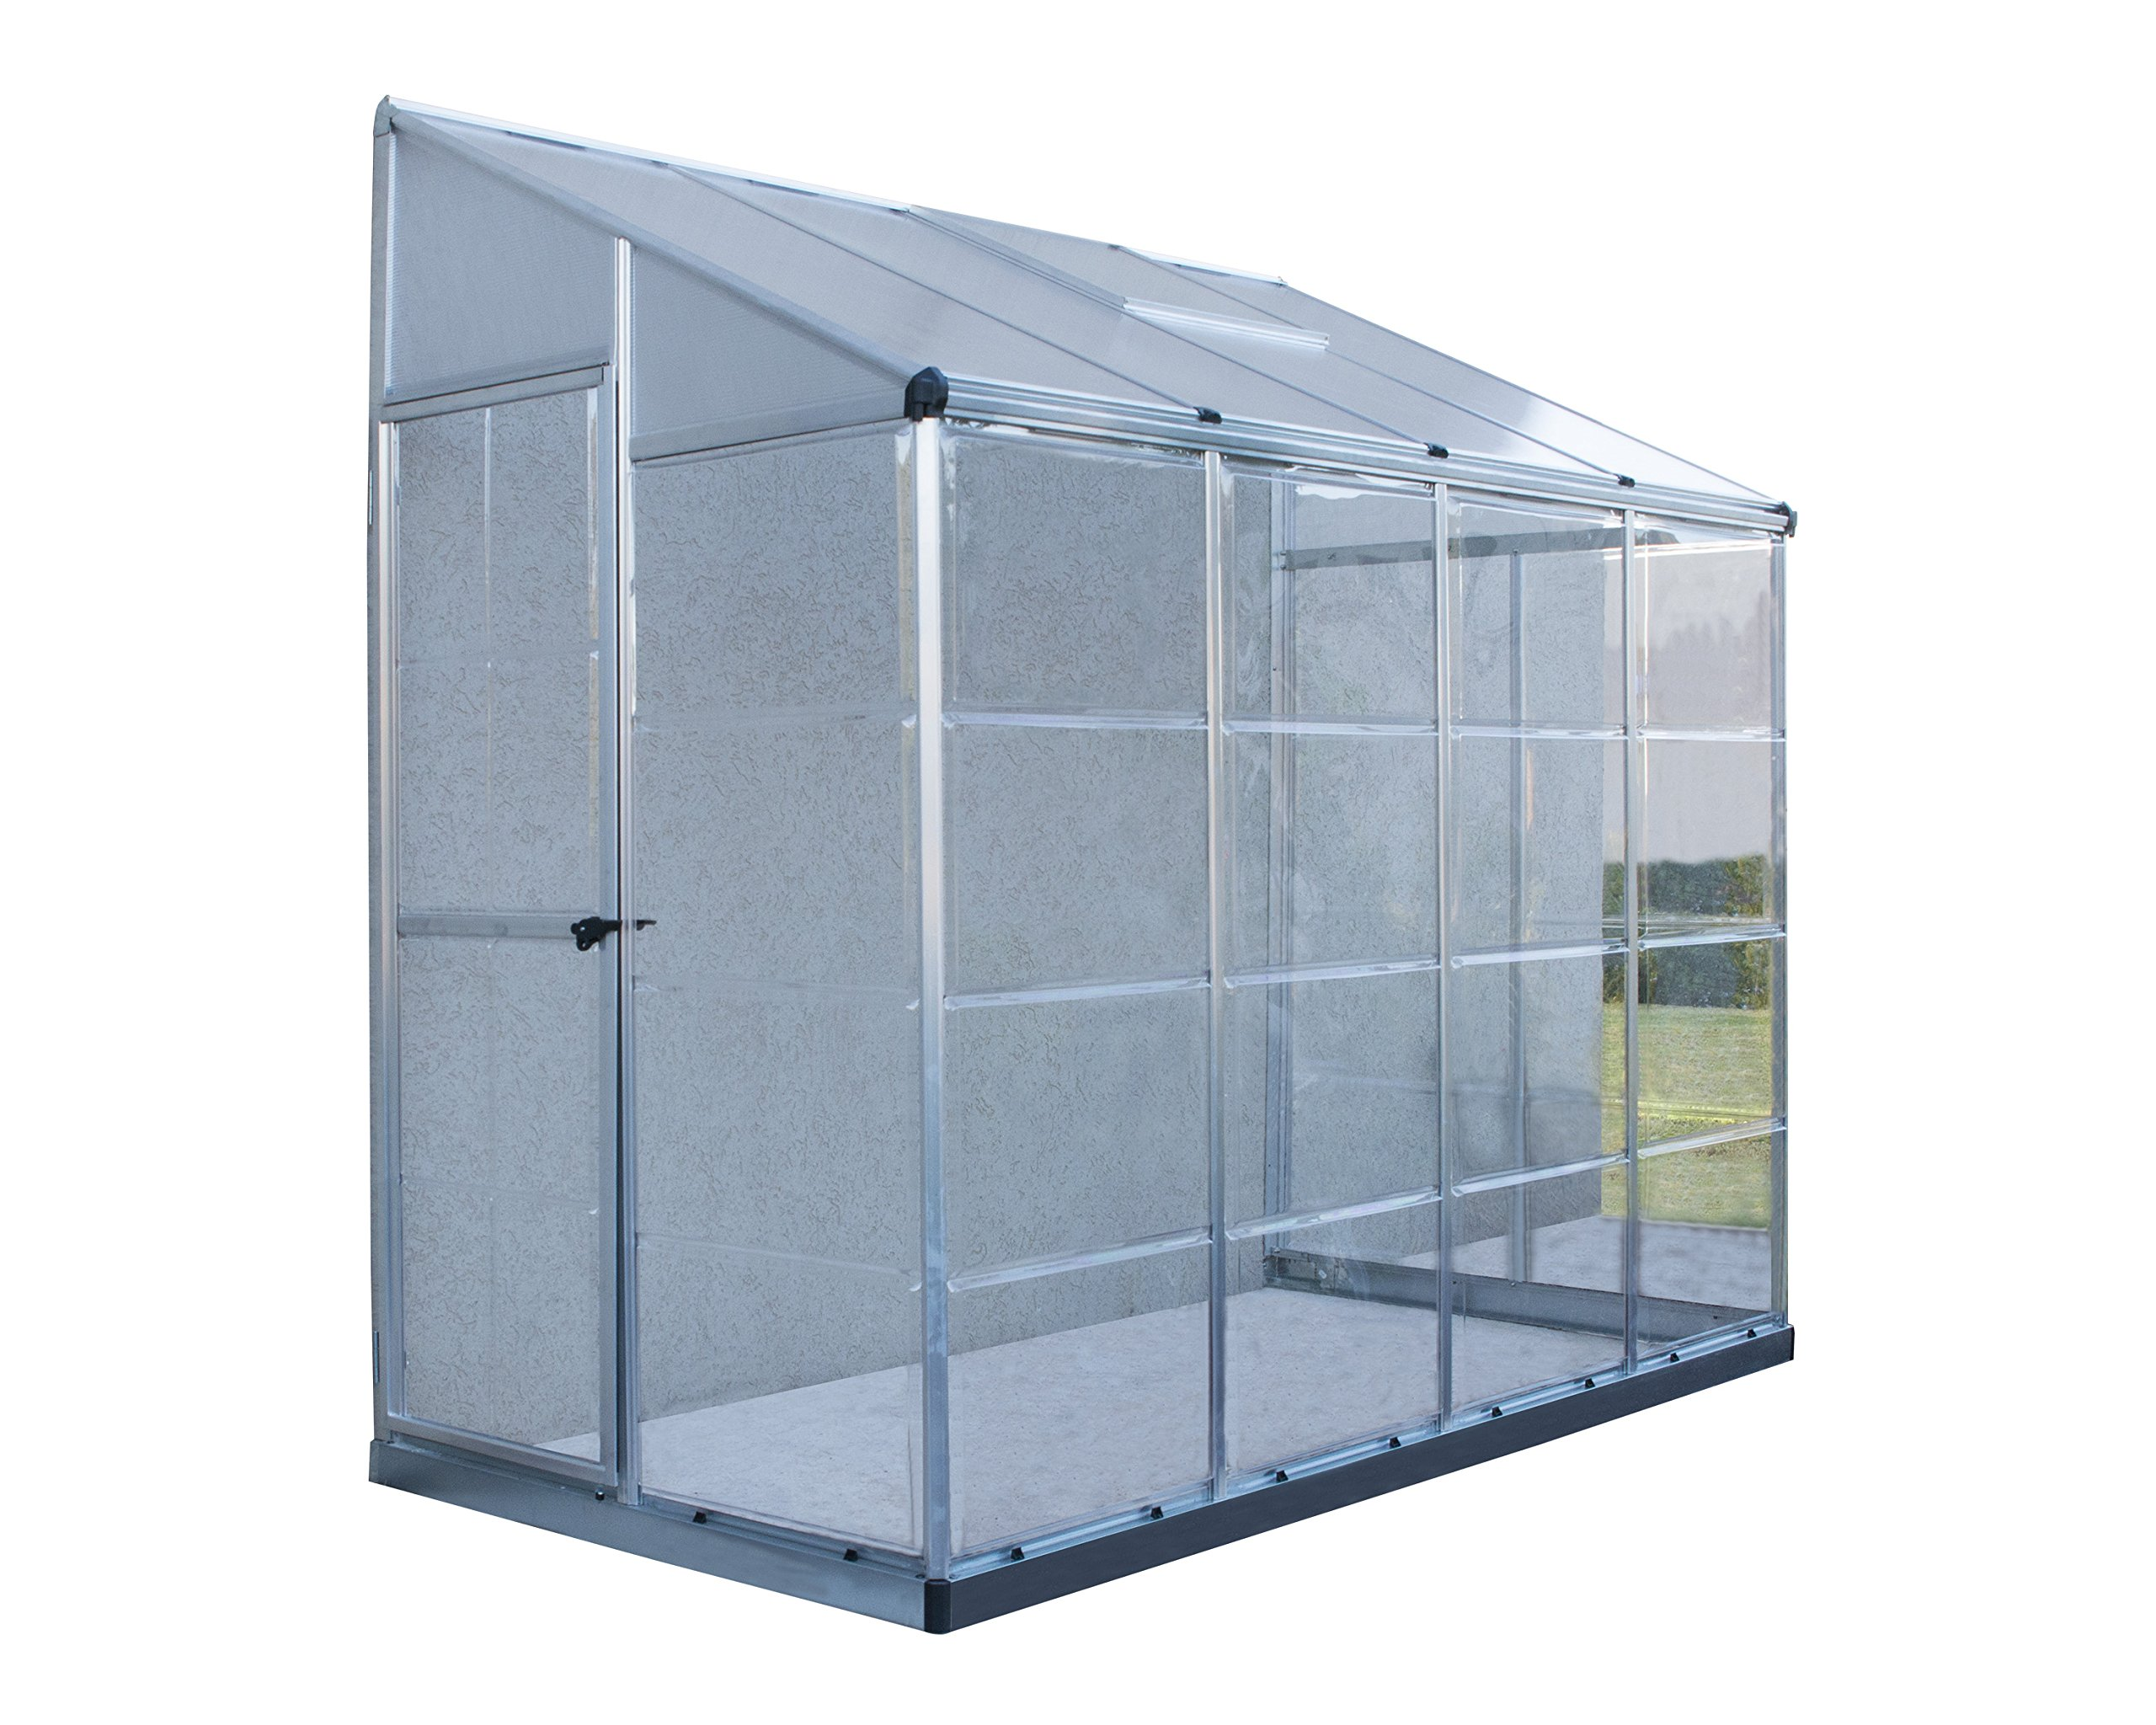 Palram Hybrid Lean-To Greenhouse - 4' x 8'